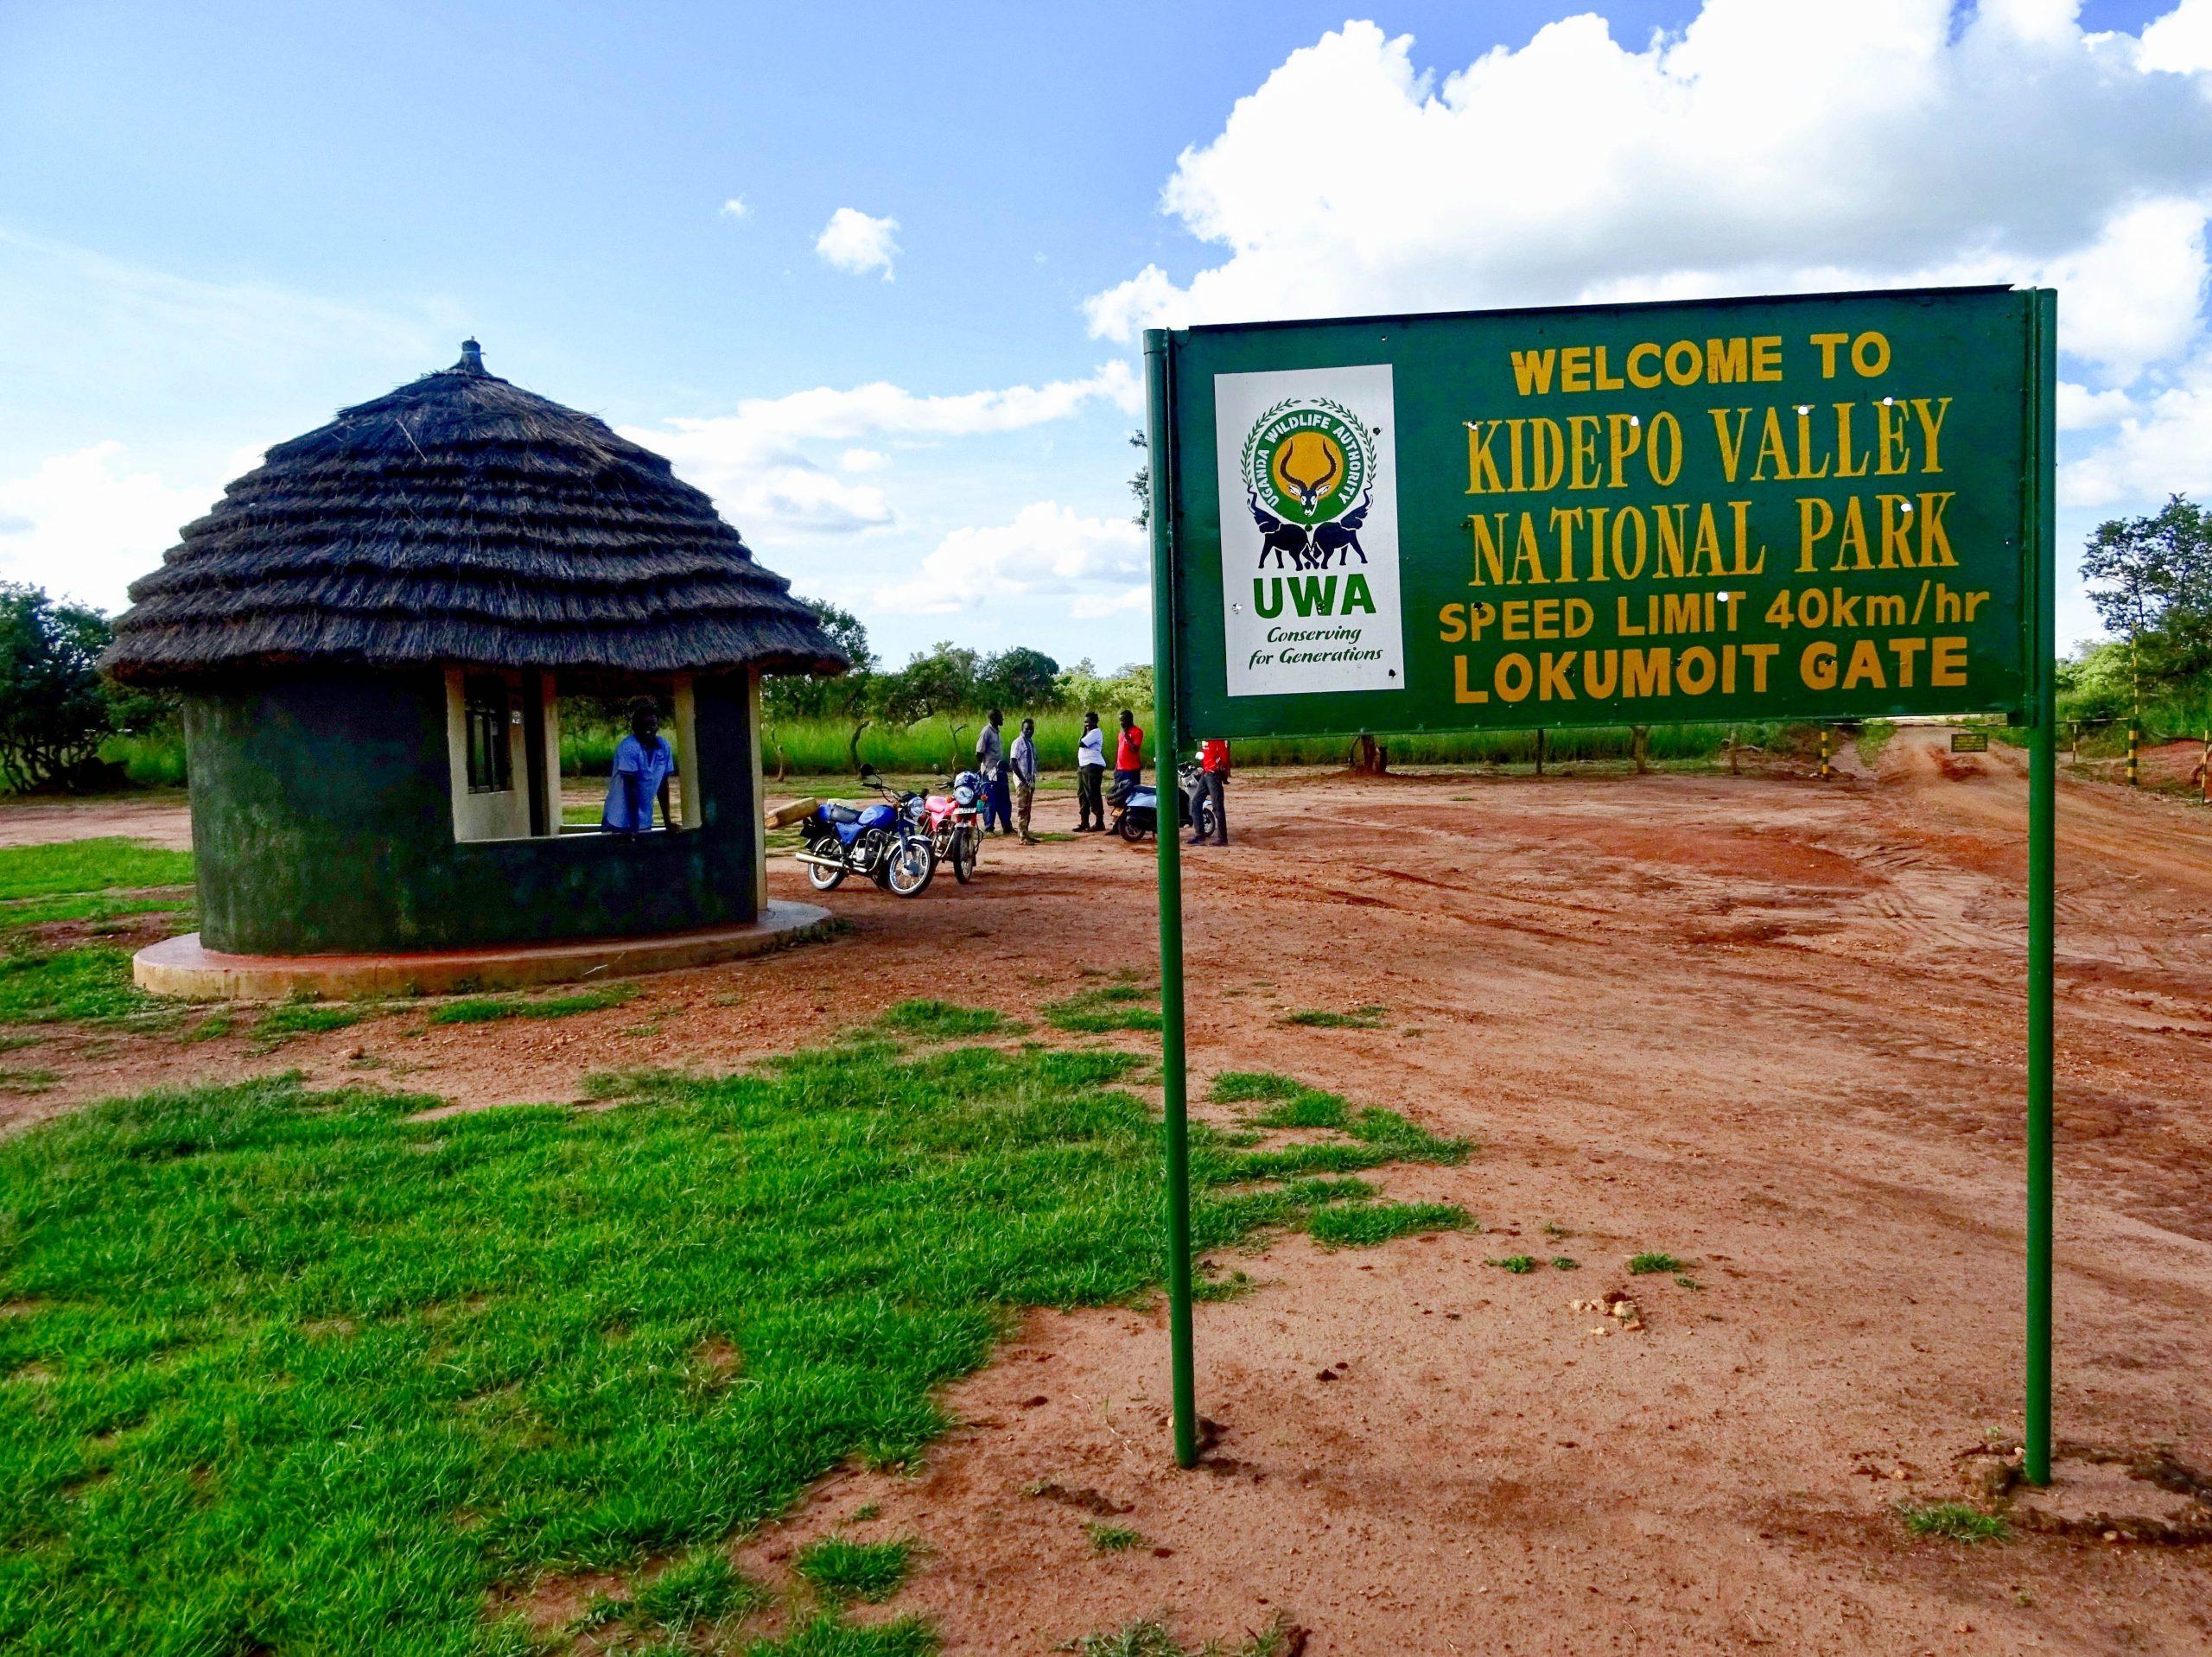 Welkomstbord Kidepo Valley National Park